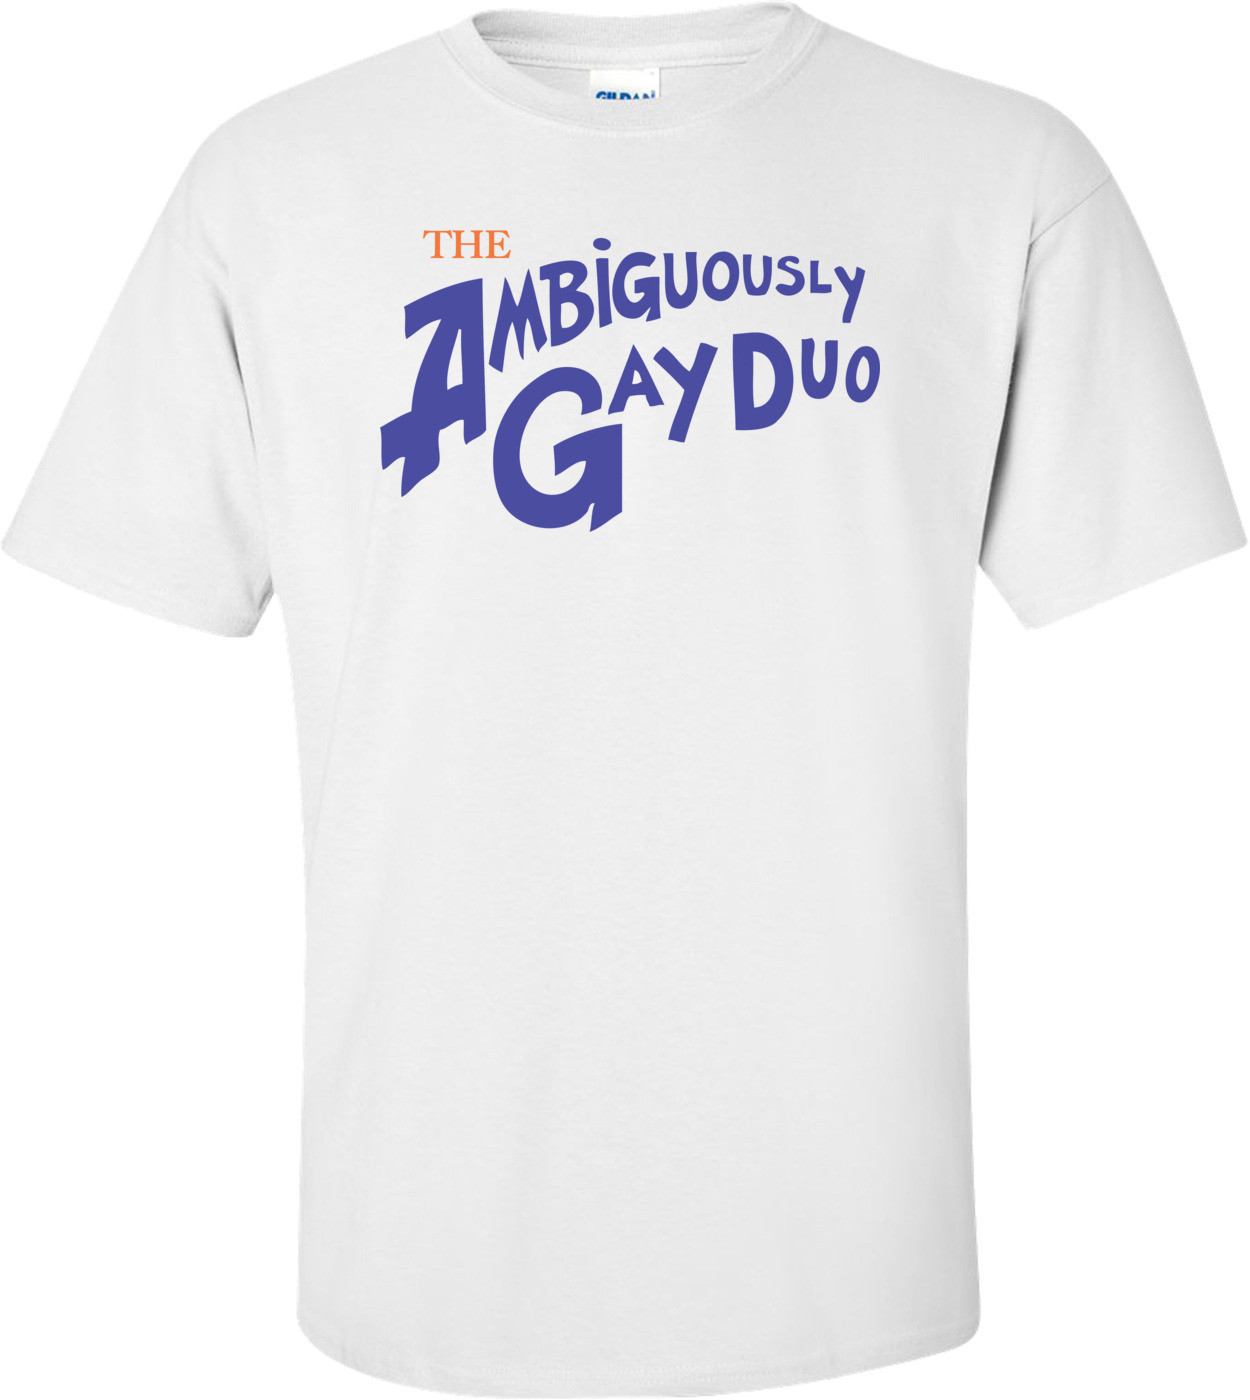 The Ambiguously Gay Duo T-shirt